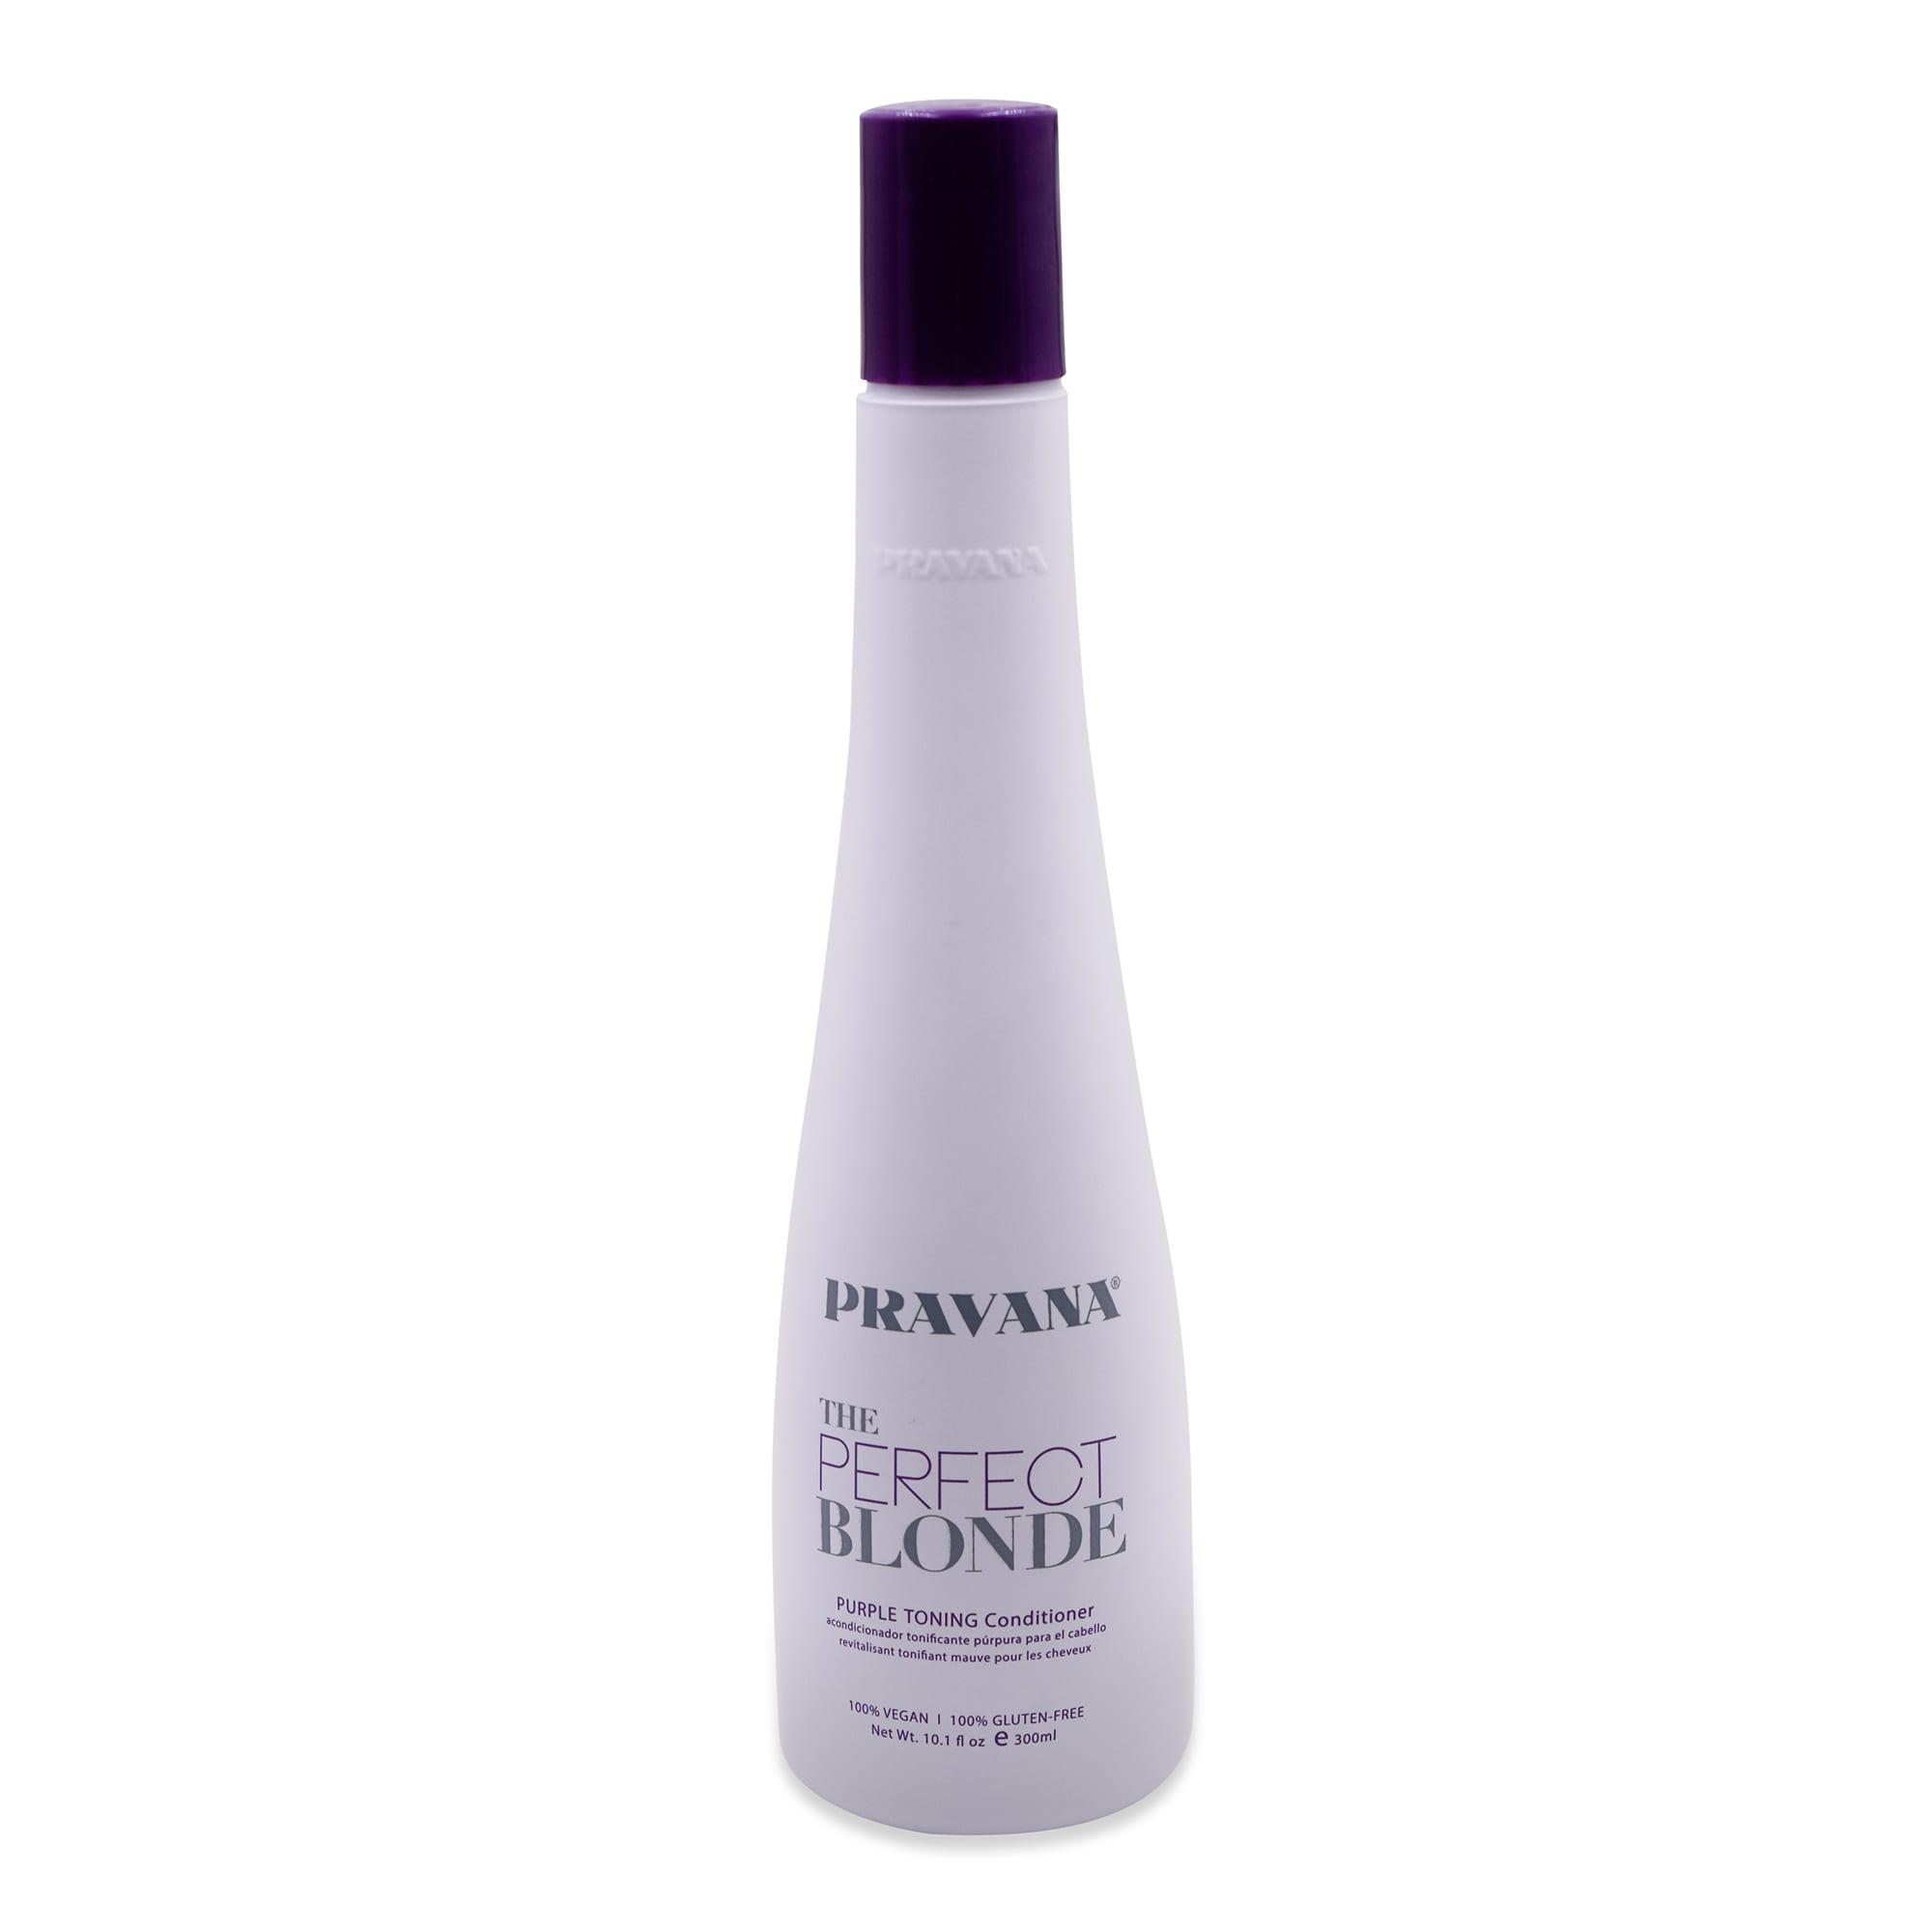 PRAVANA The Perfect Blonde Conditioner 10.1 Oz